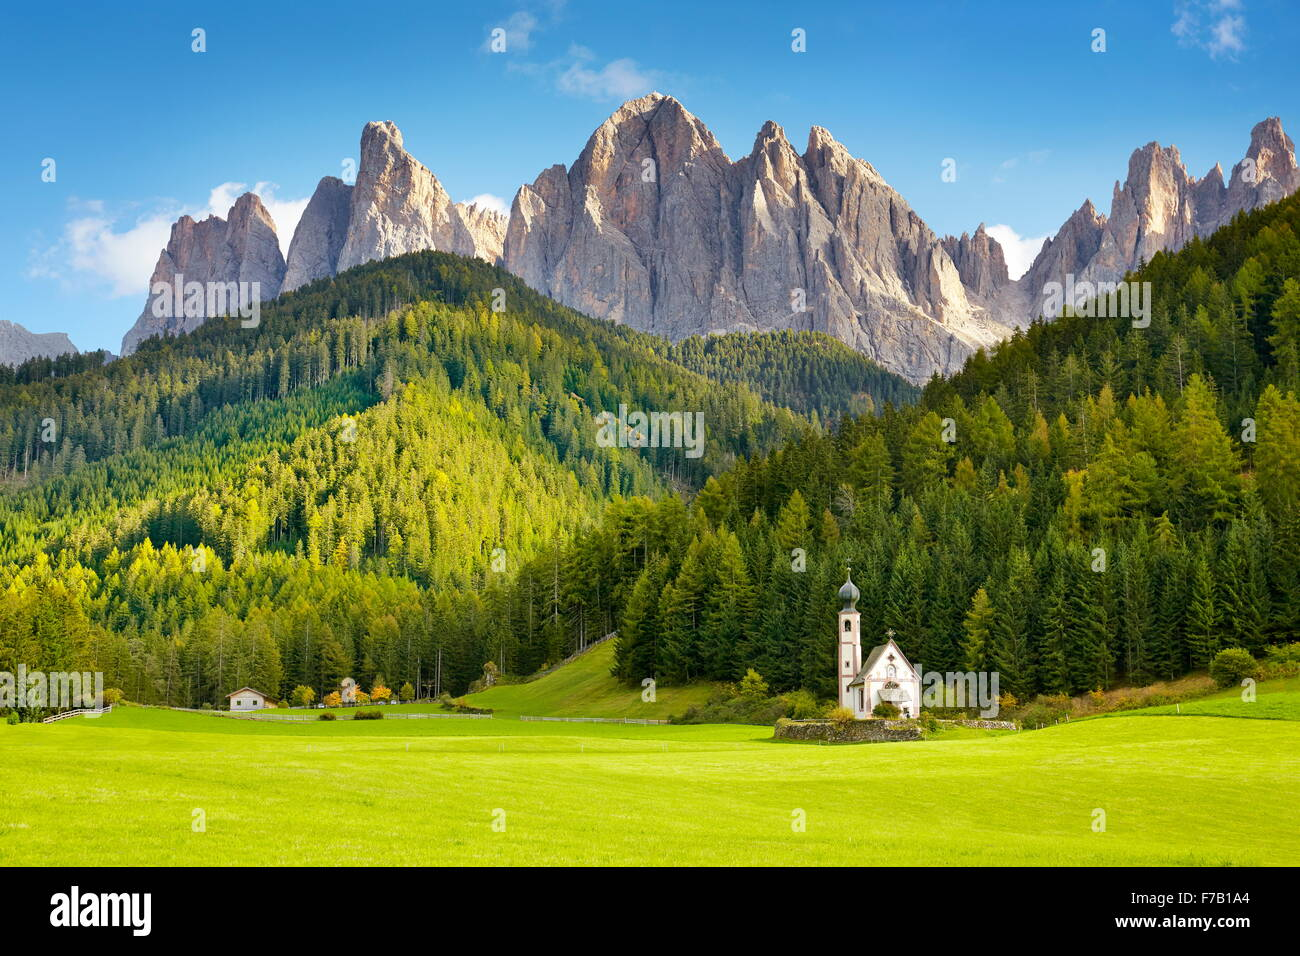 St Johann Chiesa Santa Maddalena, Alto Adige, Dolomiti Montagne Paesaggio, Italia Foto Stock